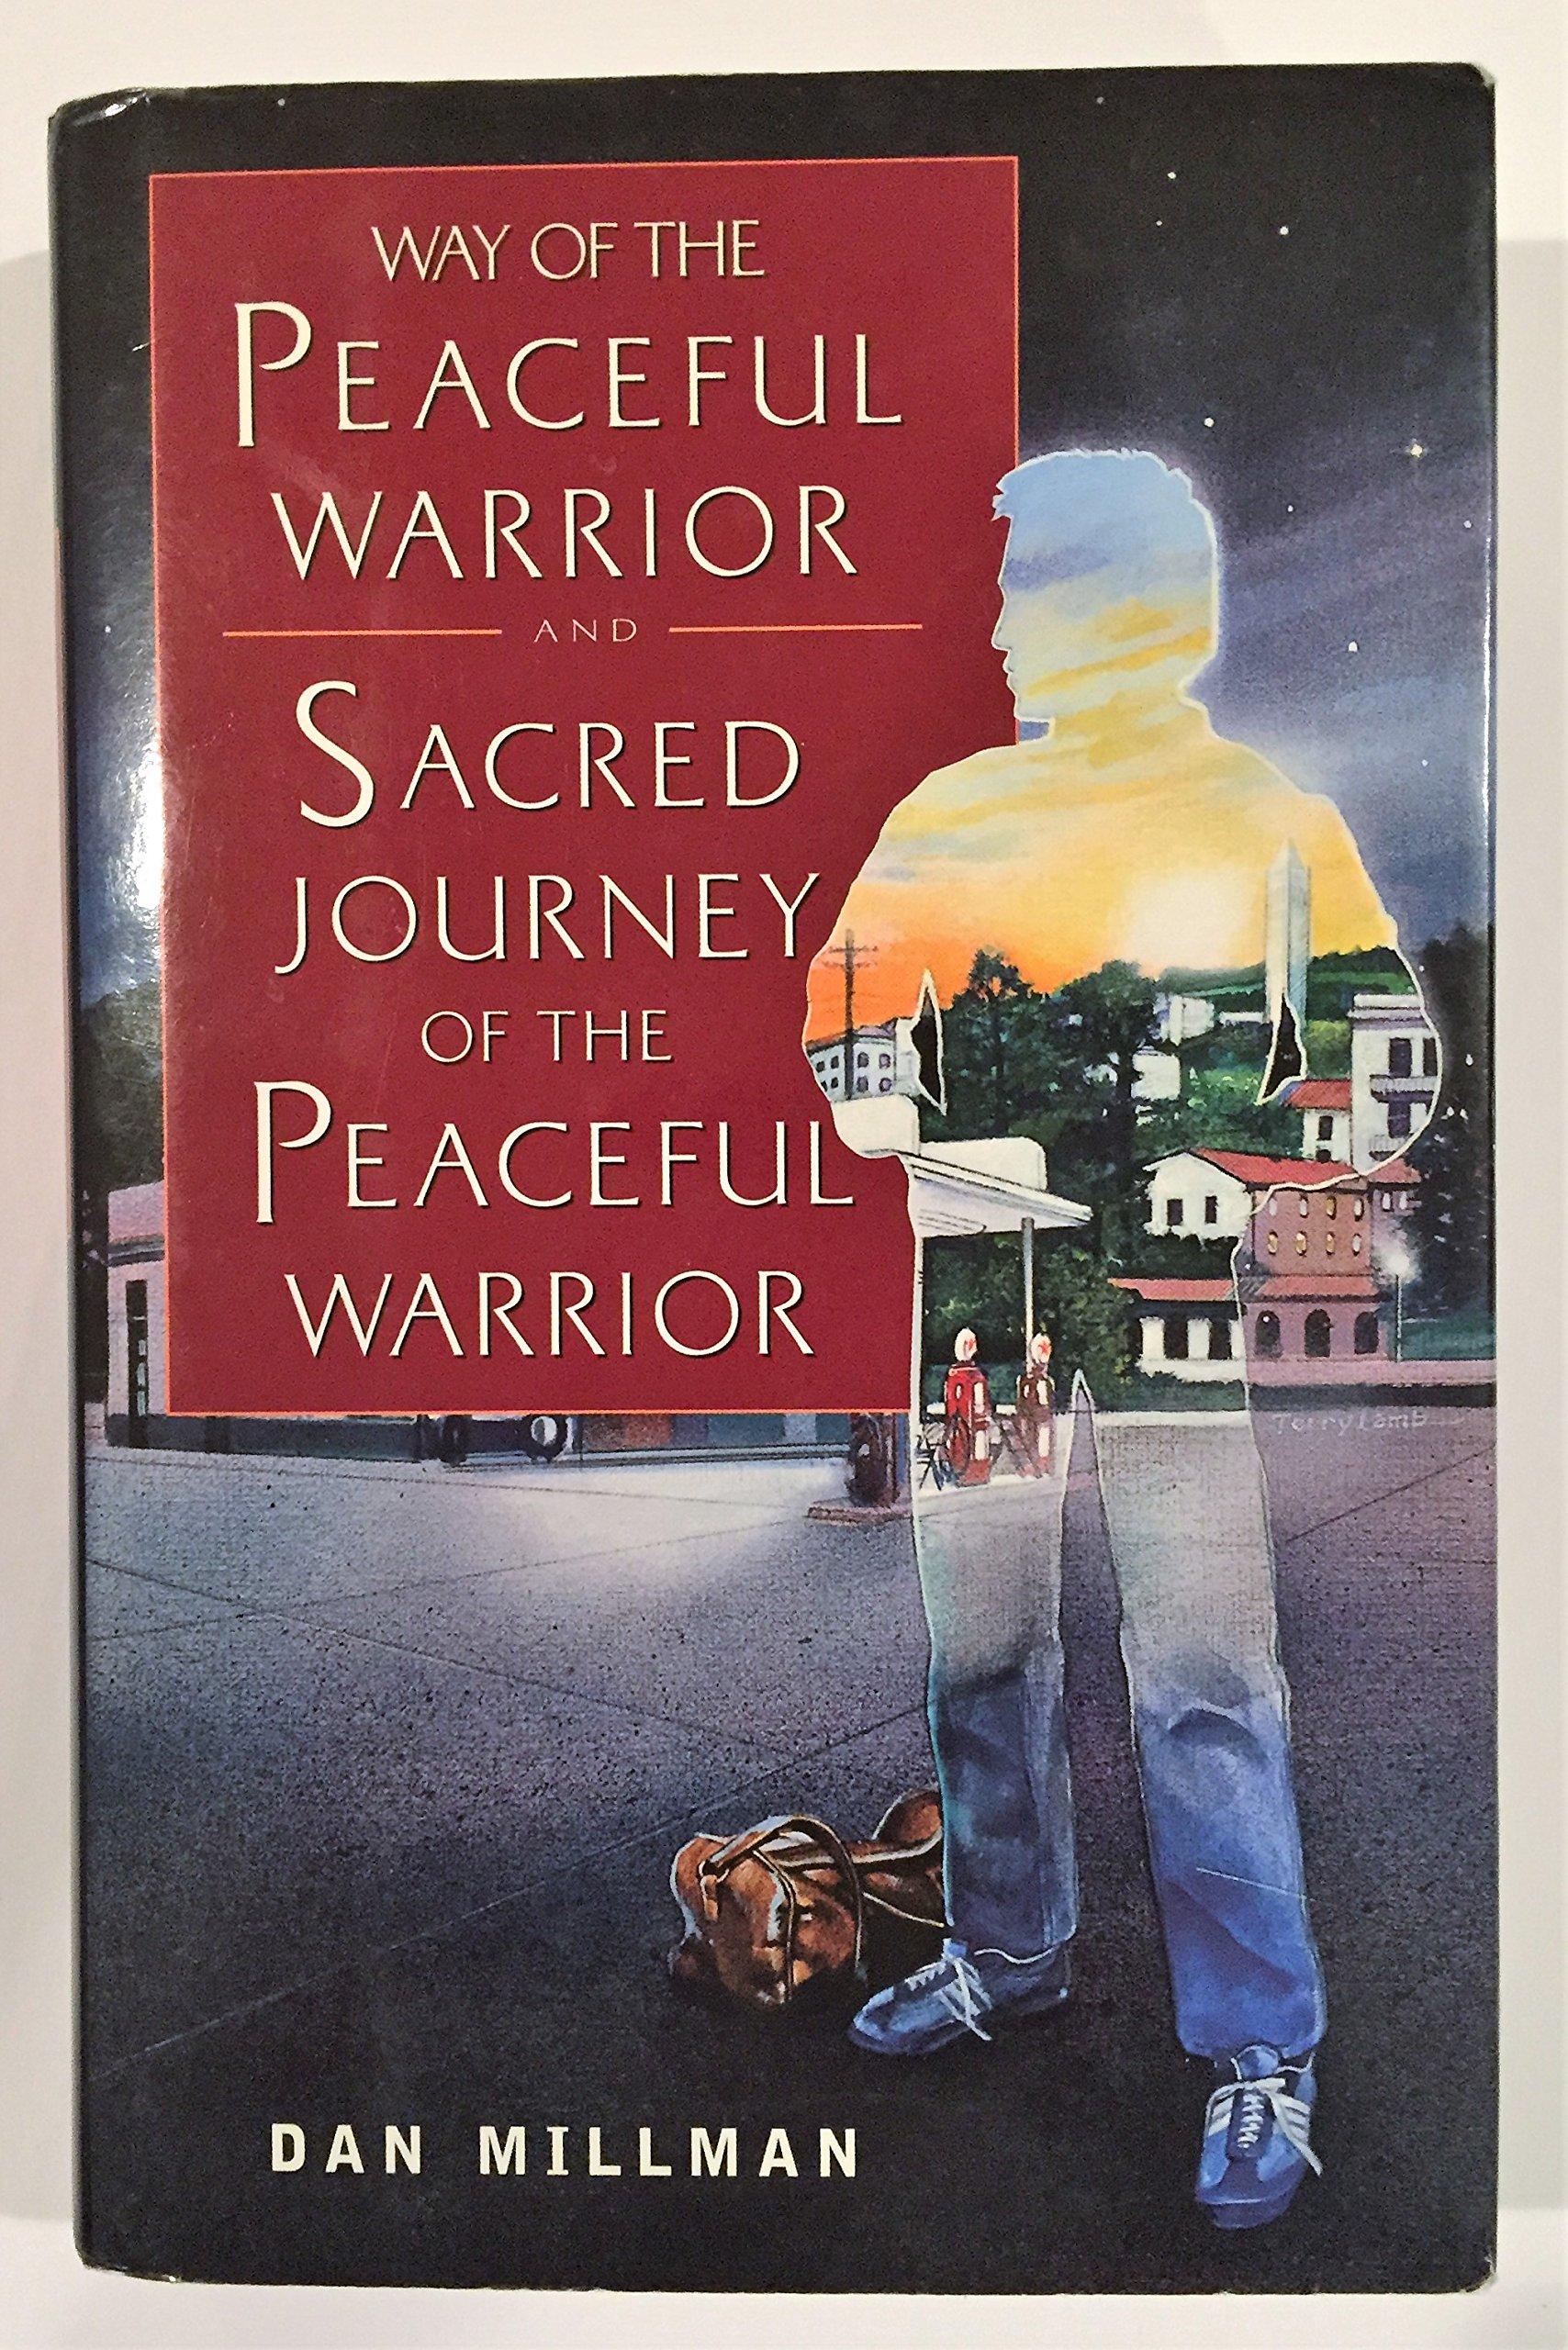 dan millman way of the peaceful warrior